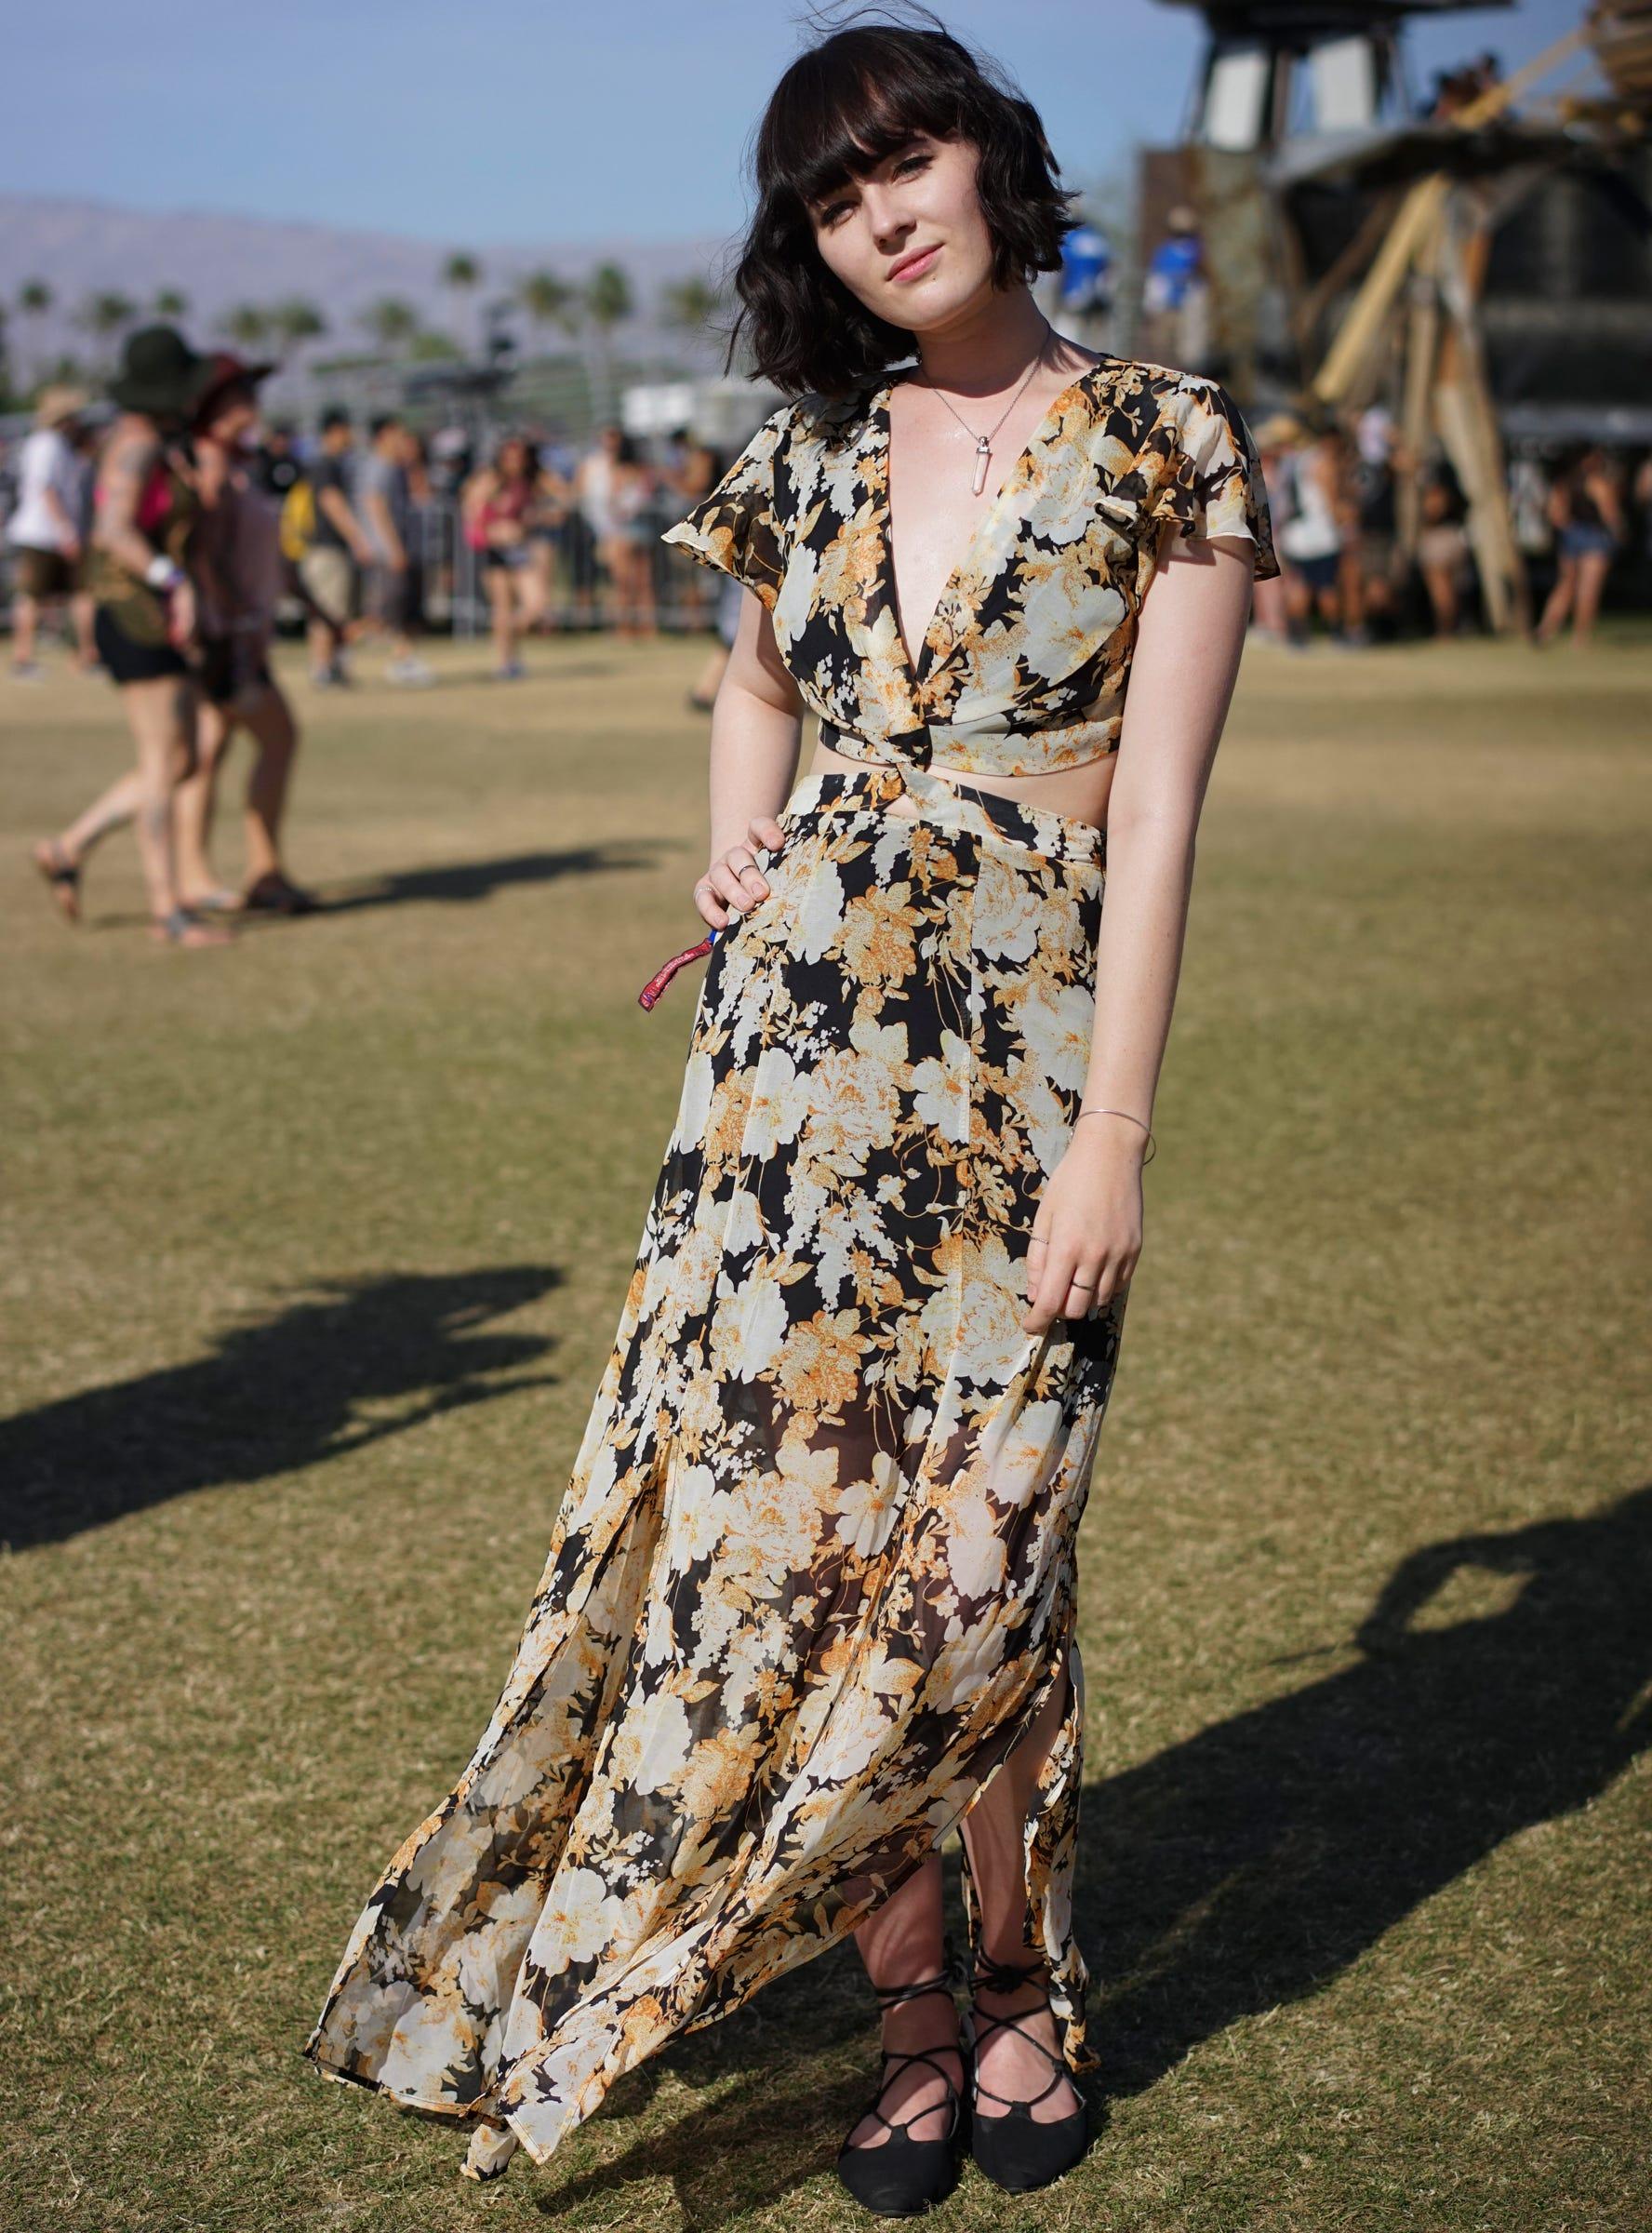 Coachella music festival 2016 street style photos izmirmasajfo